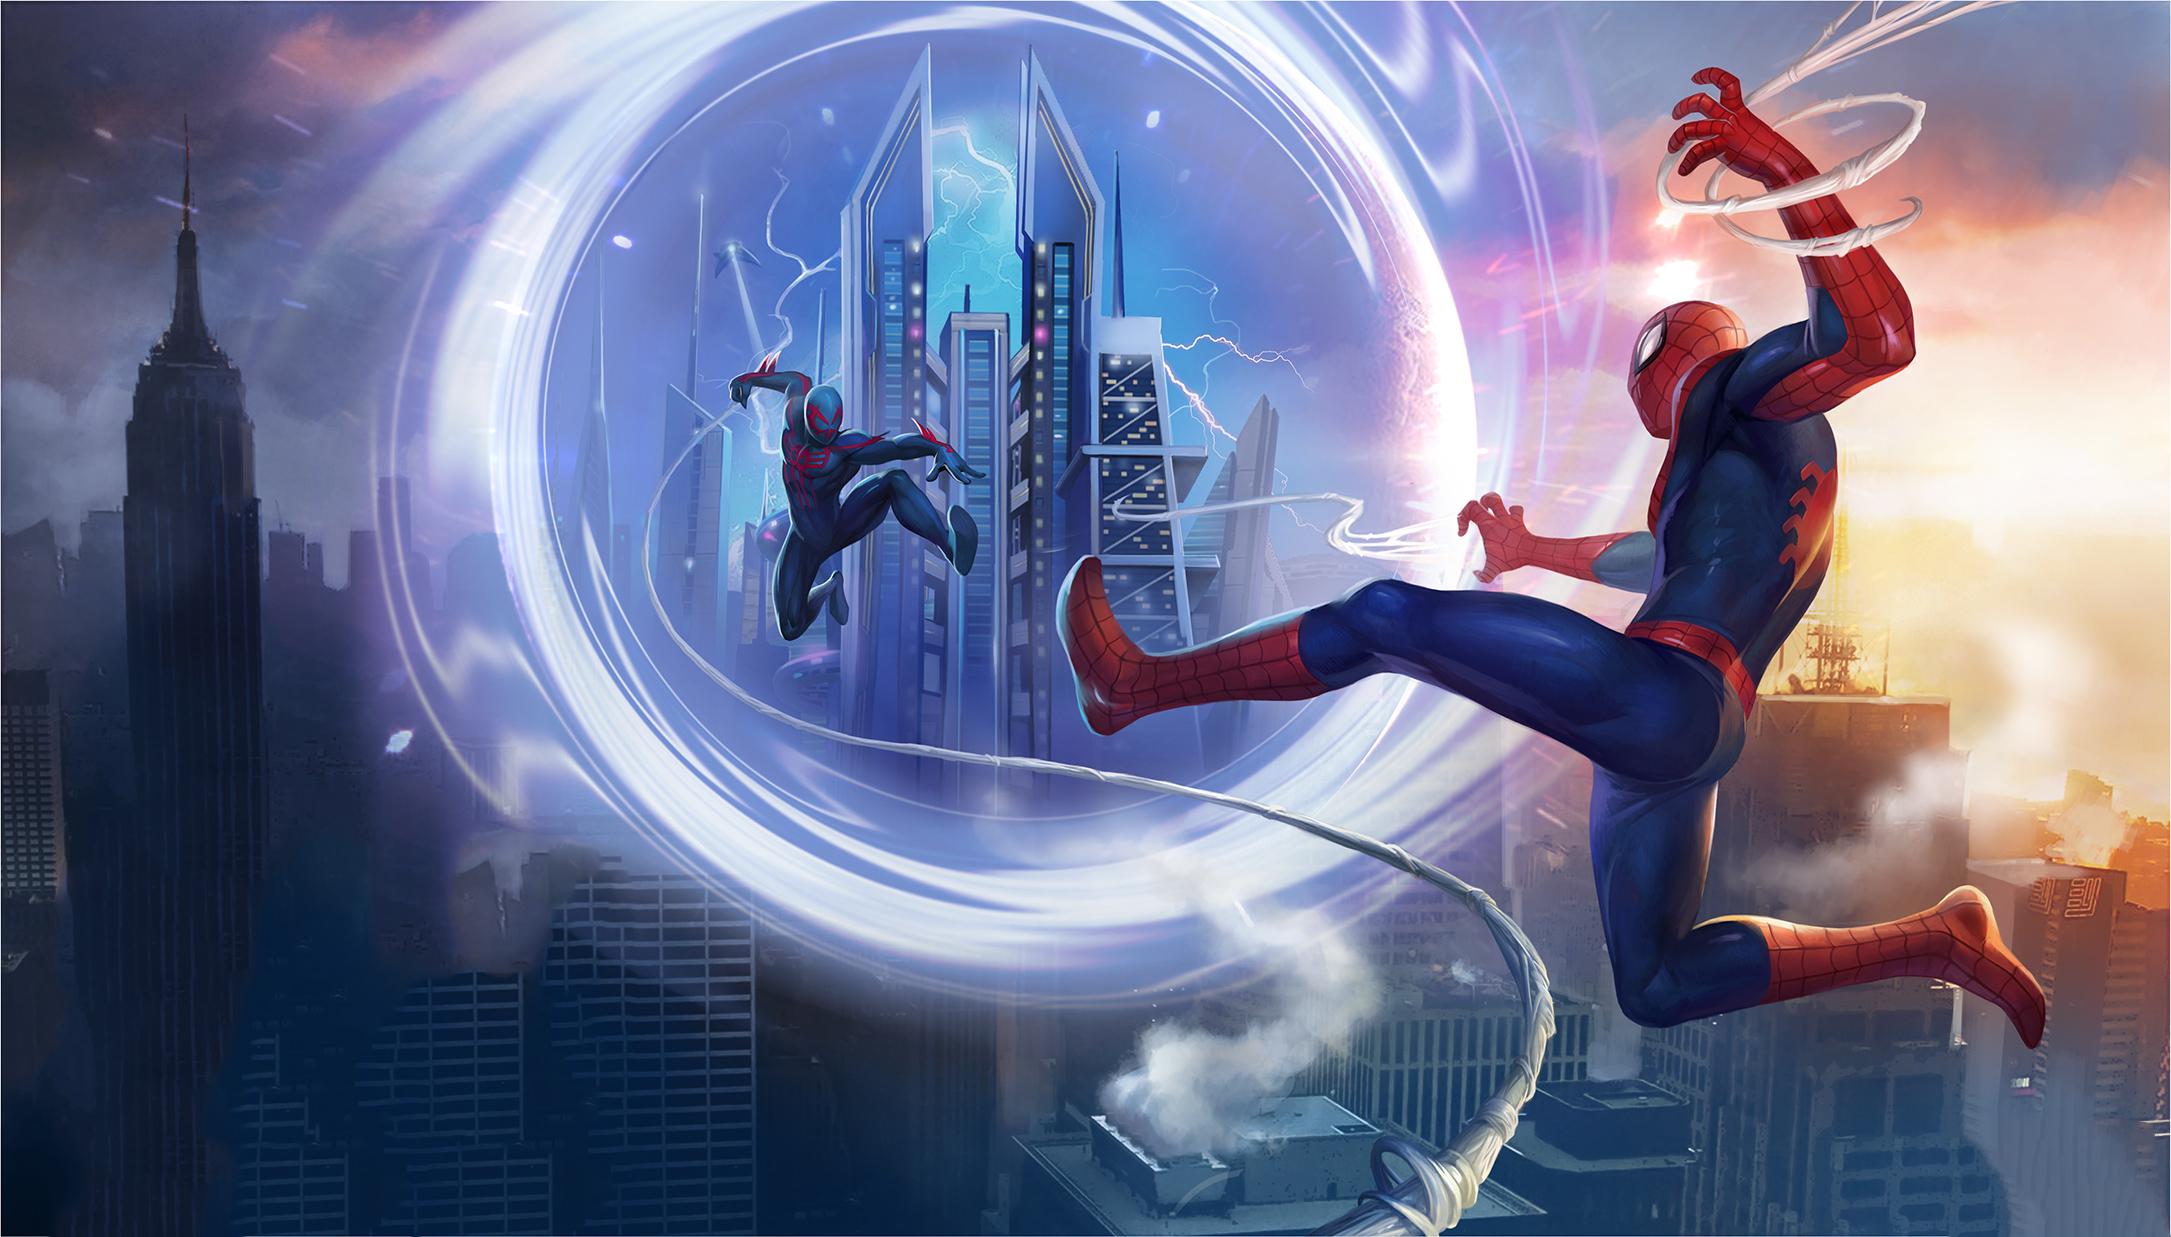 spiderman unlimited iilustration 4k 1544923251 - SpiderMan Unlimited IIlustration 4k - superheroes wallpapers, spiderman wallpapers, hd-wallpapers, digital art wallpapers, behance wallpapers, artwork wallpapers